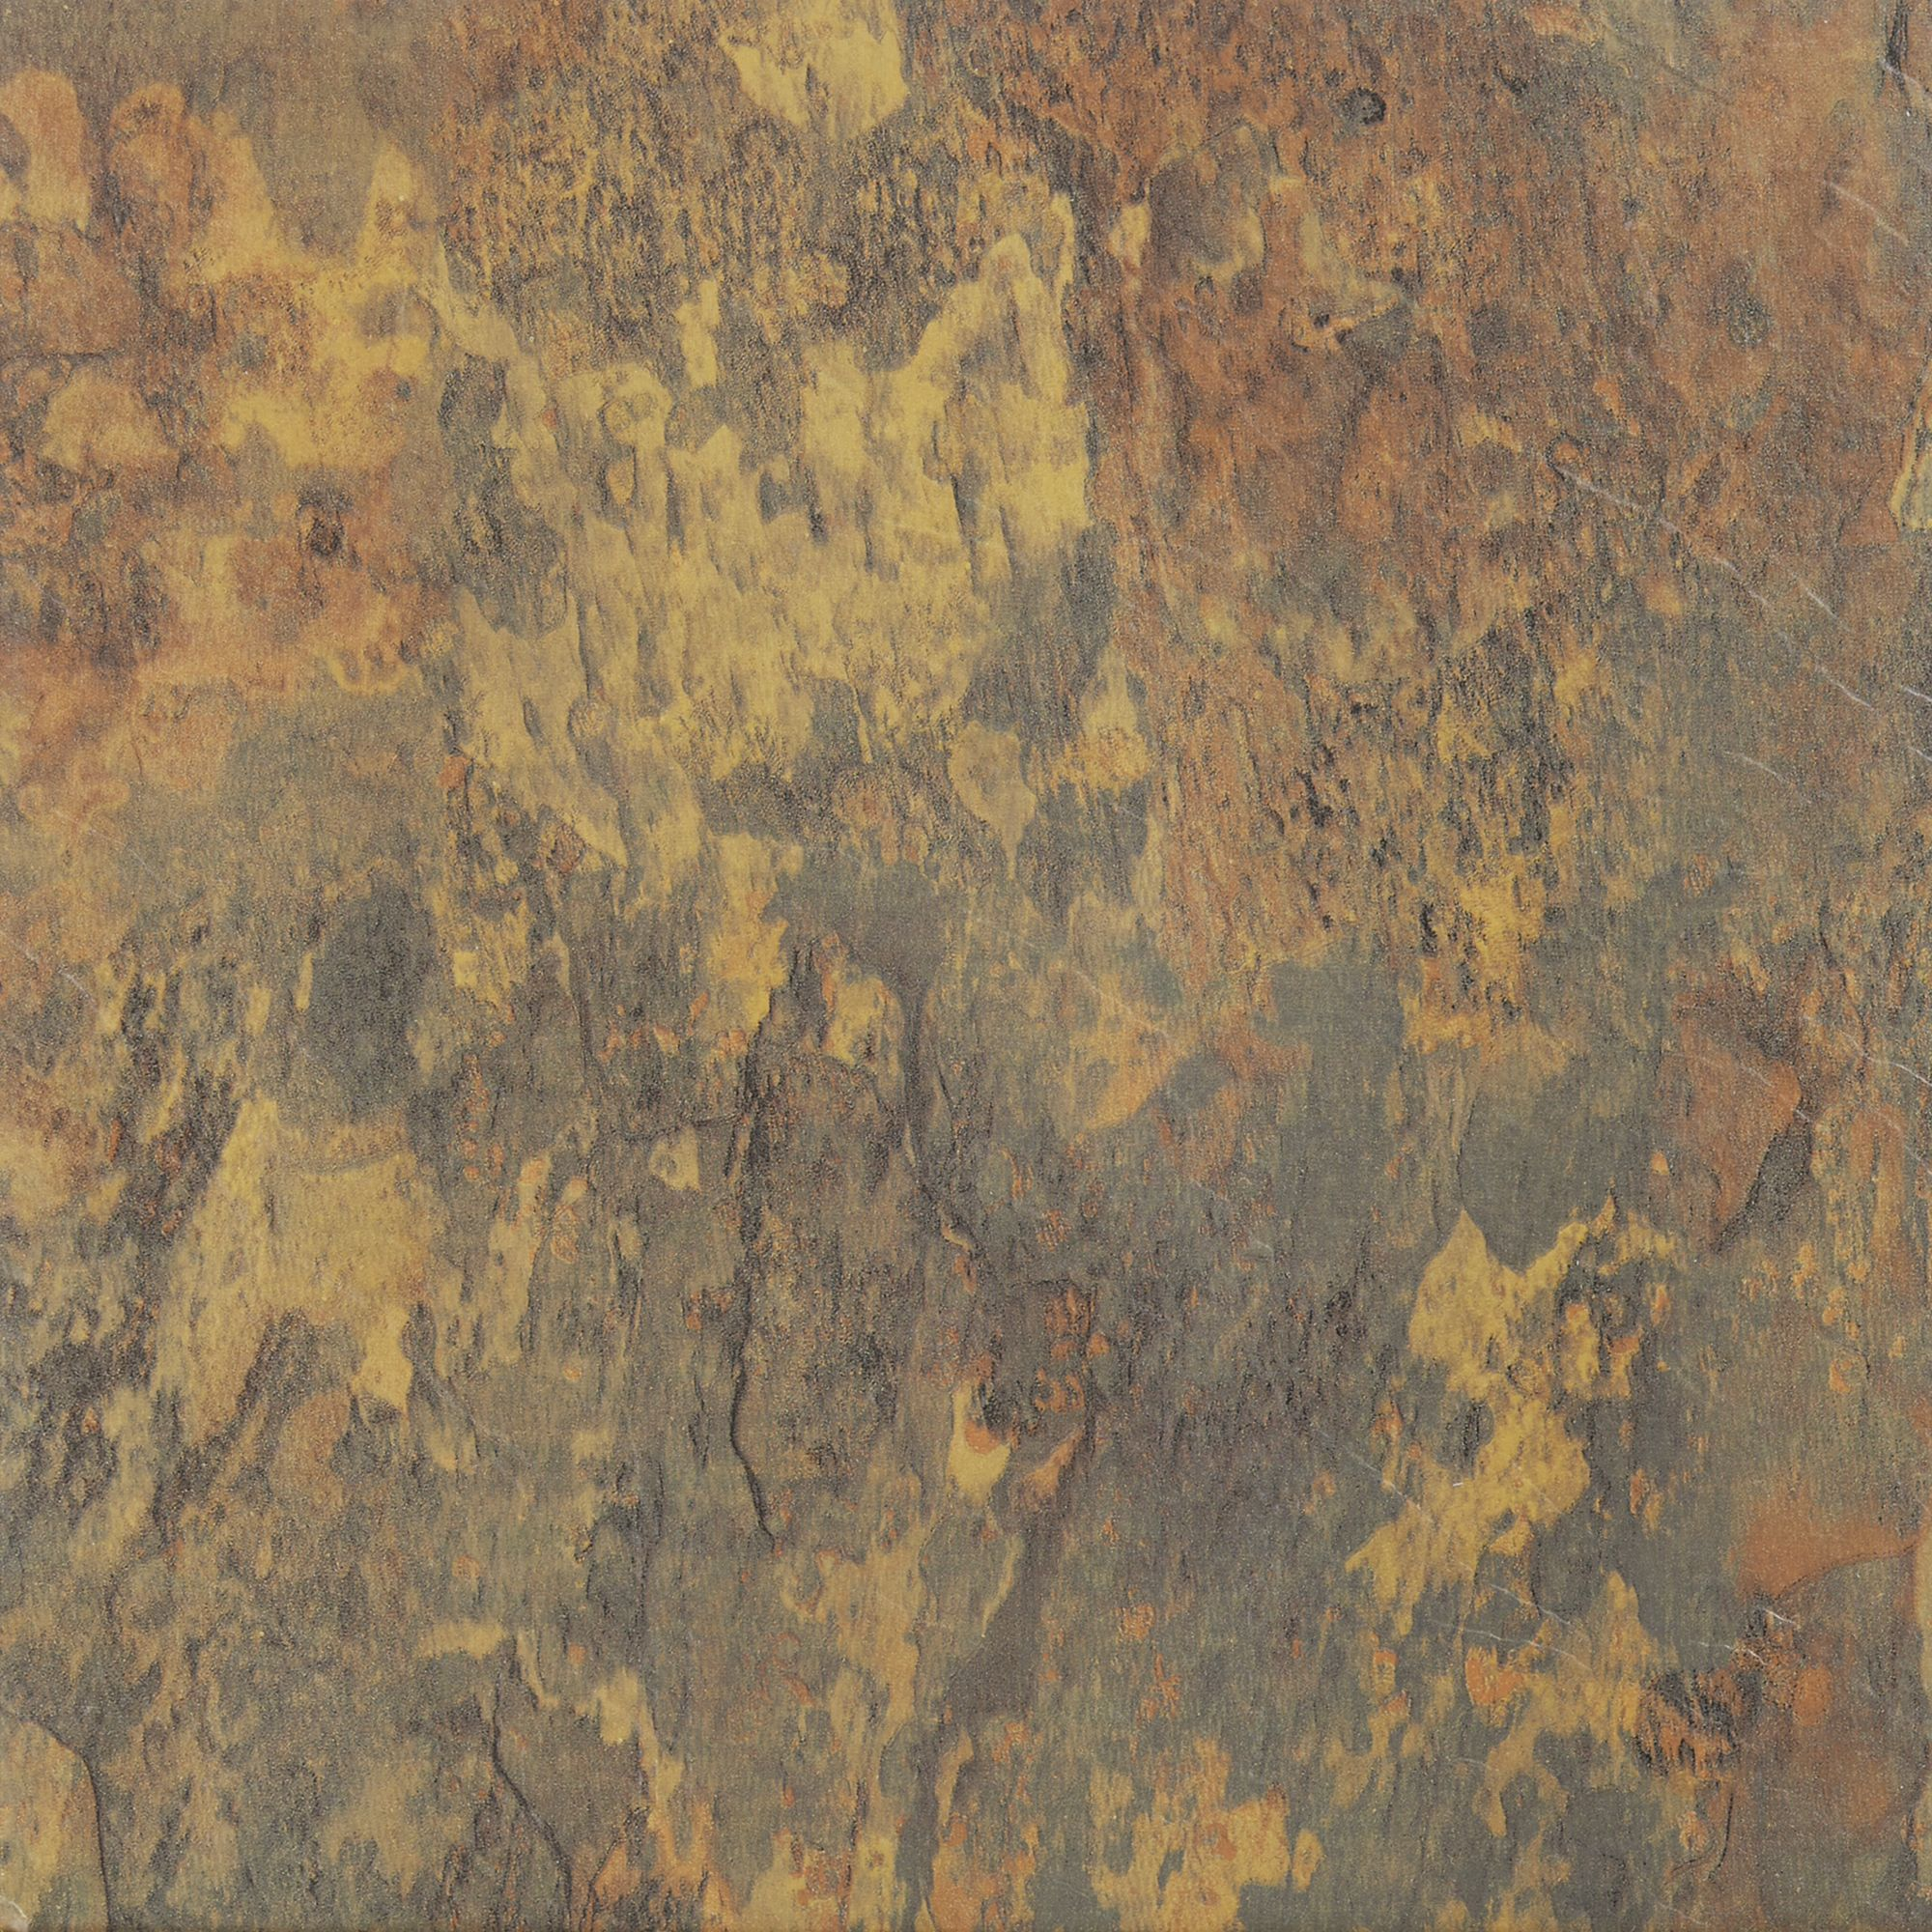 Achim Nexus Antique Marble 12x12 Self Adhesive Vinyl Floor Tile - 20 Tiles/20 sq. ft.